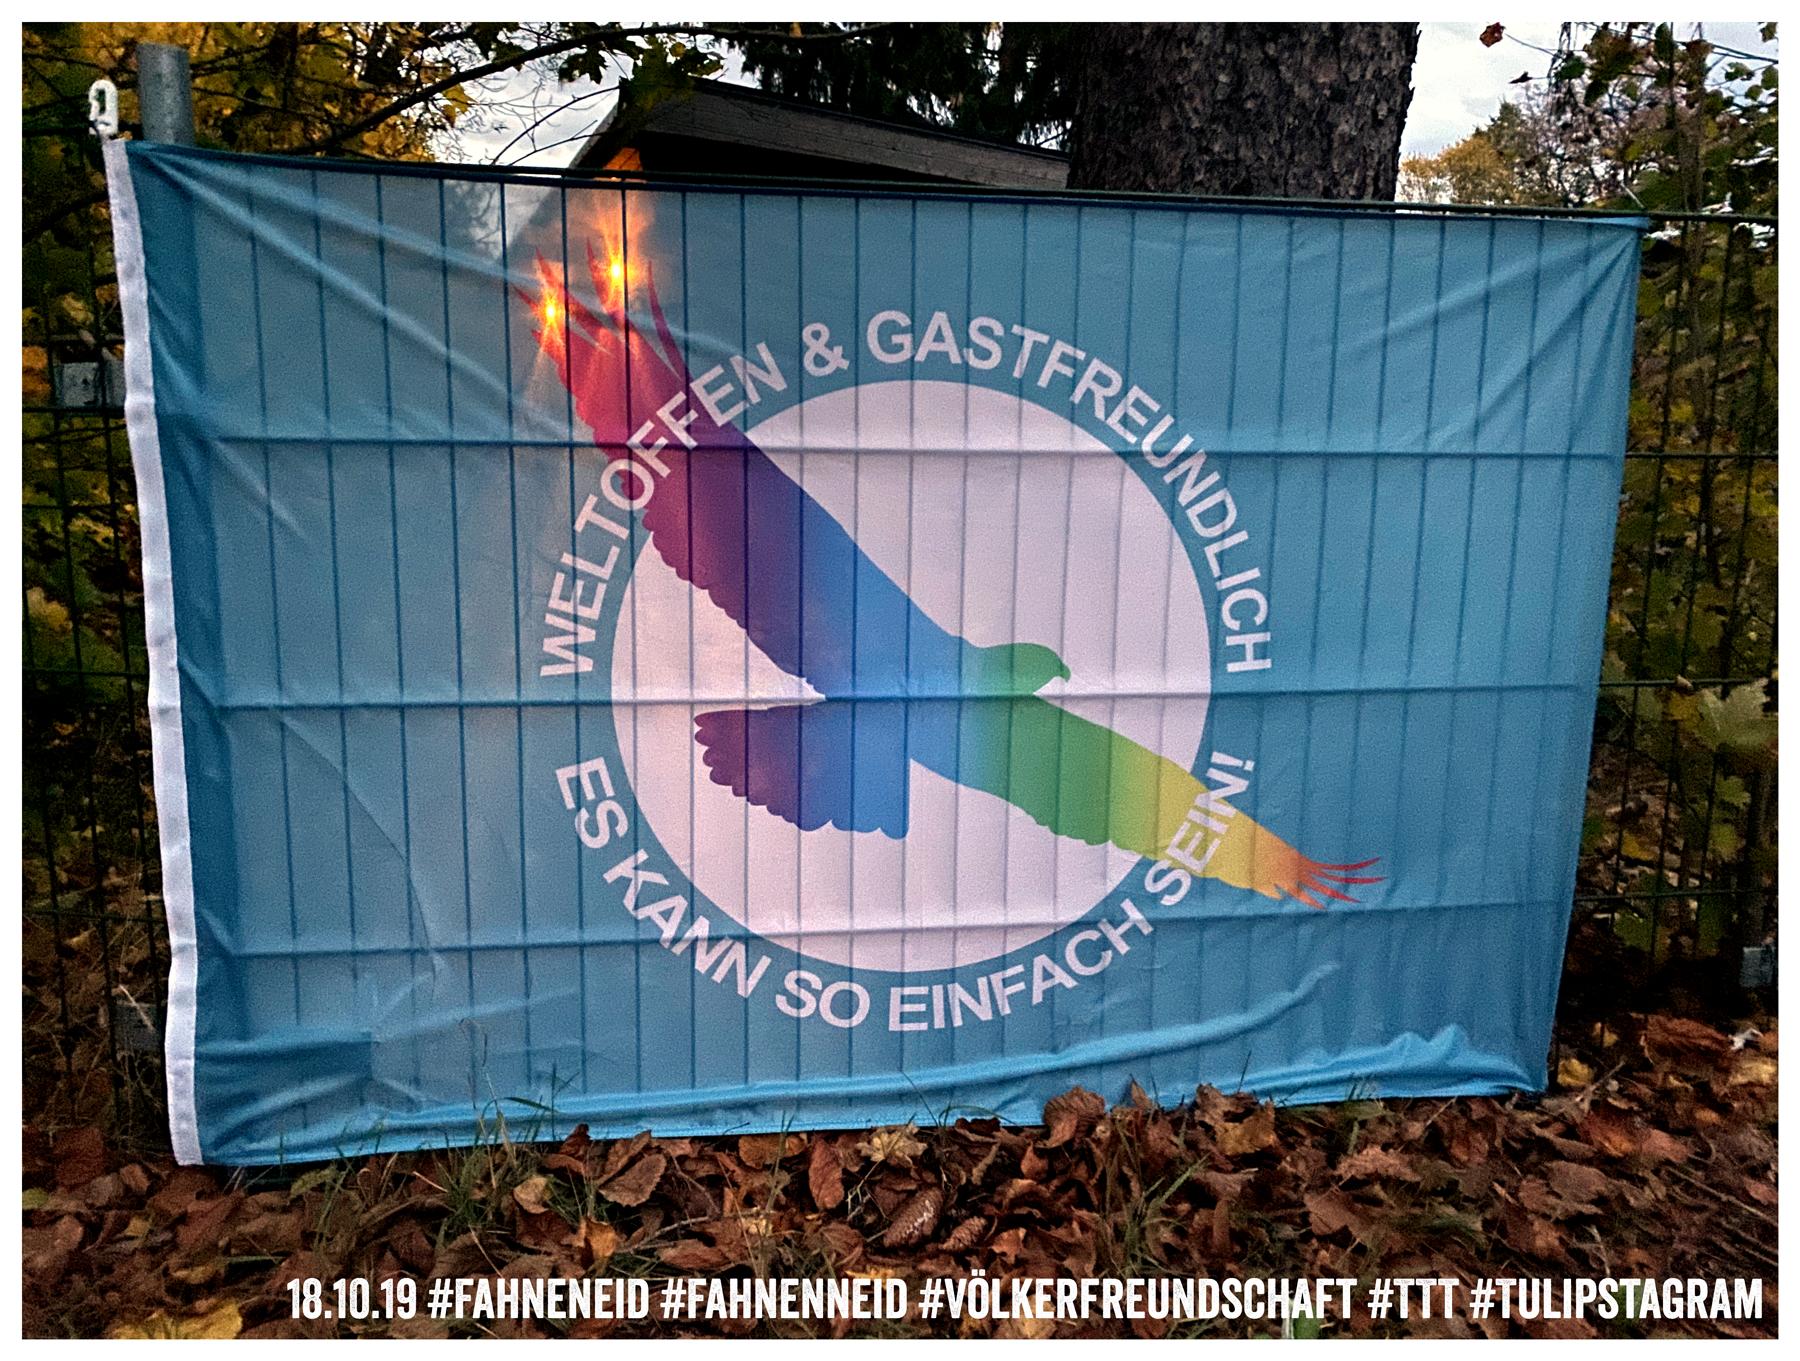 18.10.19 #Fahneneid #Fahnenneid #Völkerfreundschaft #TTT #Tulipstagram